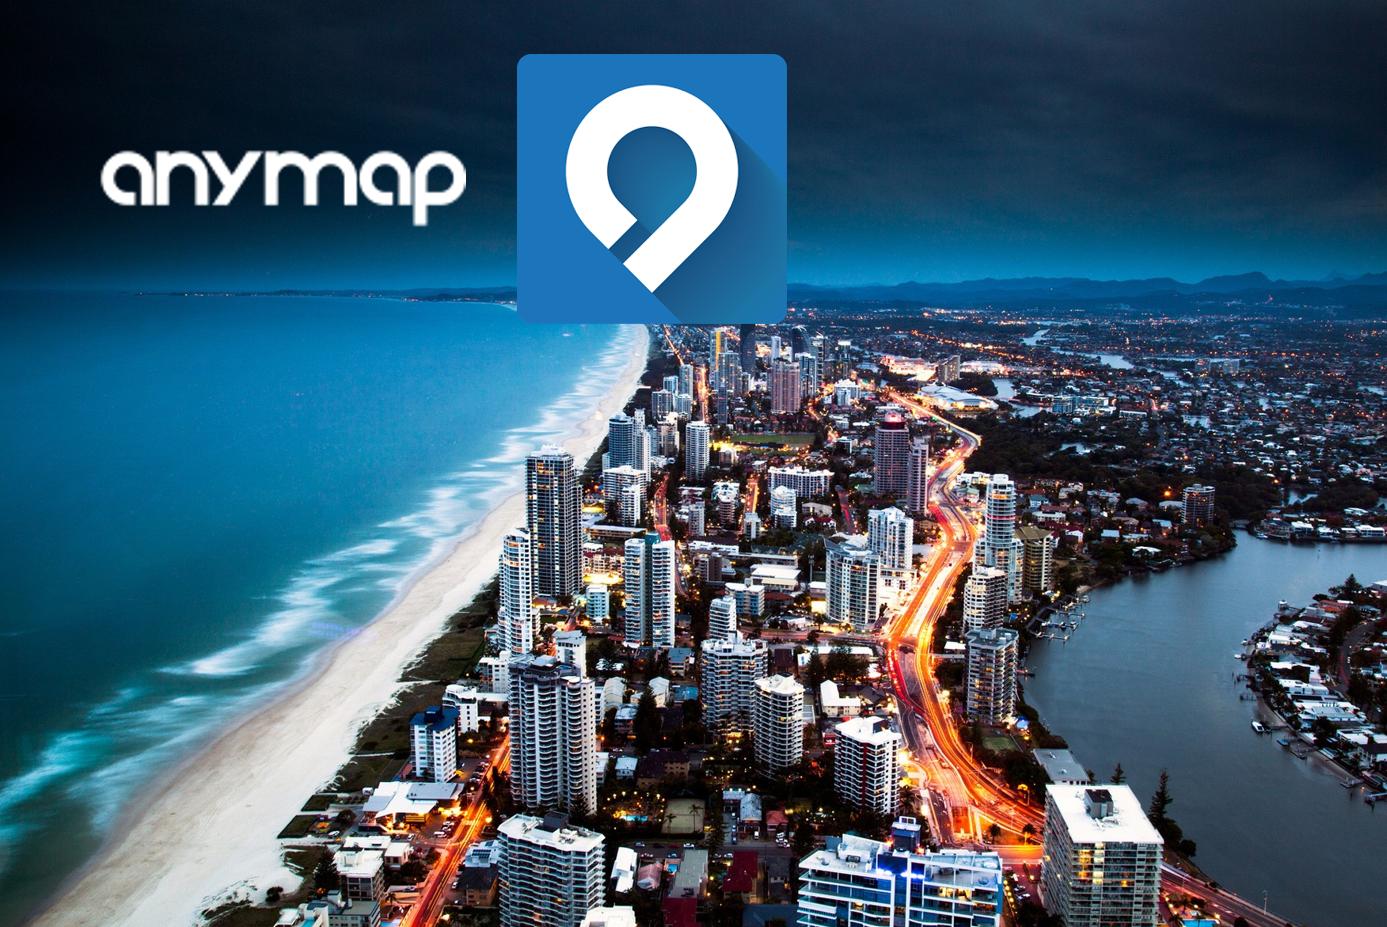 anymap